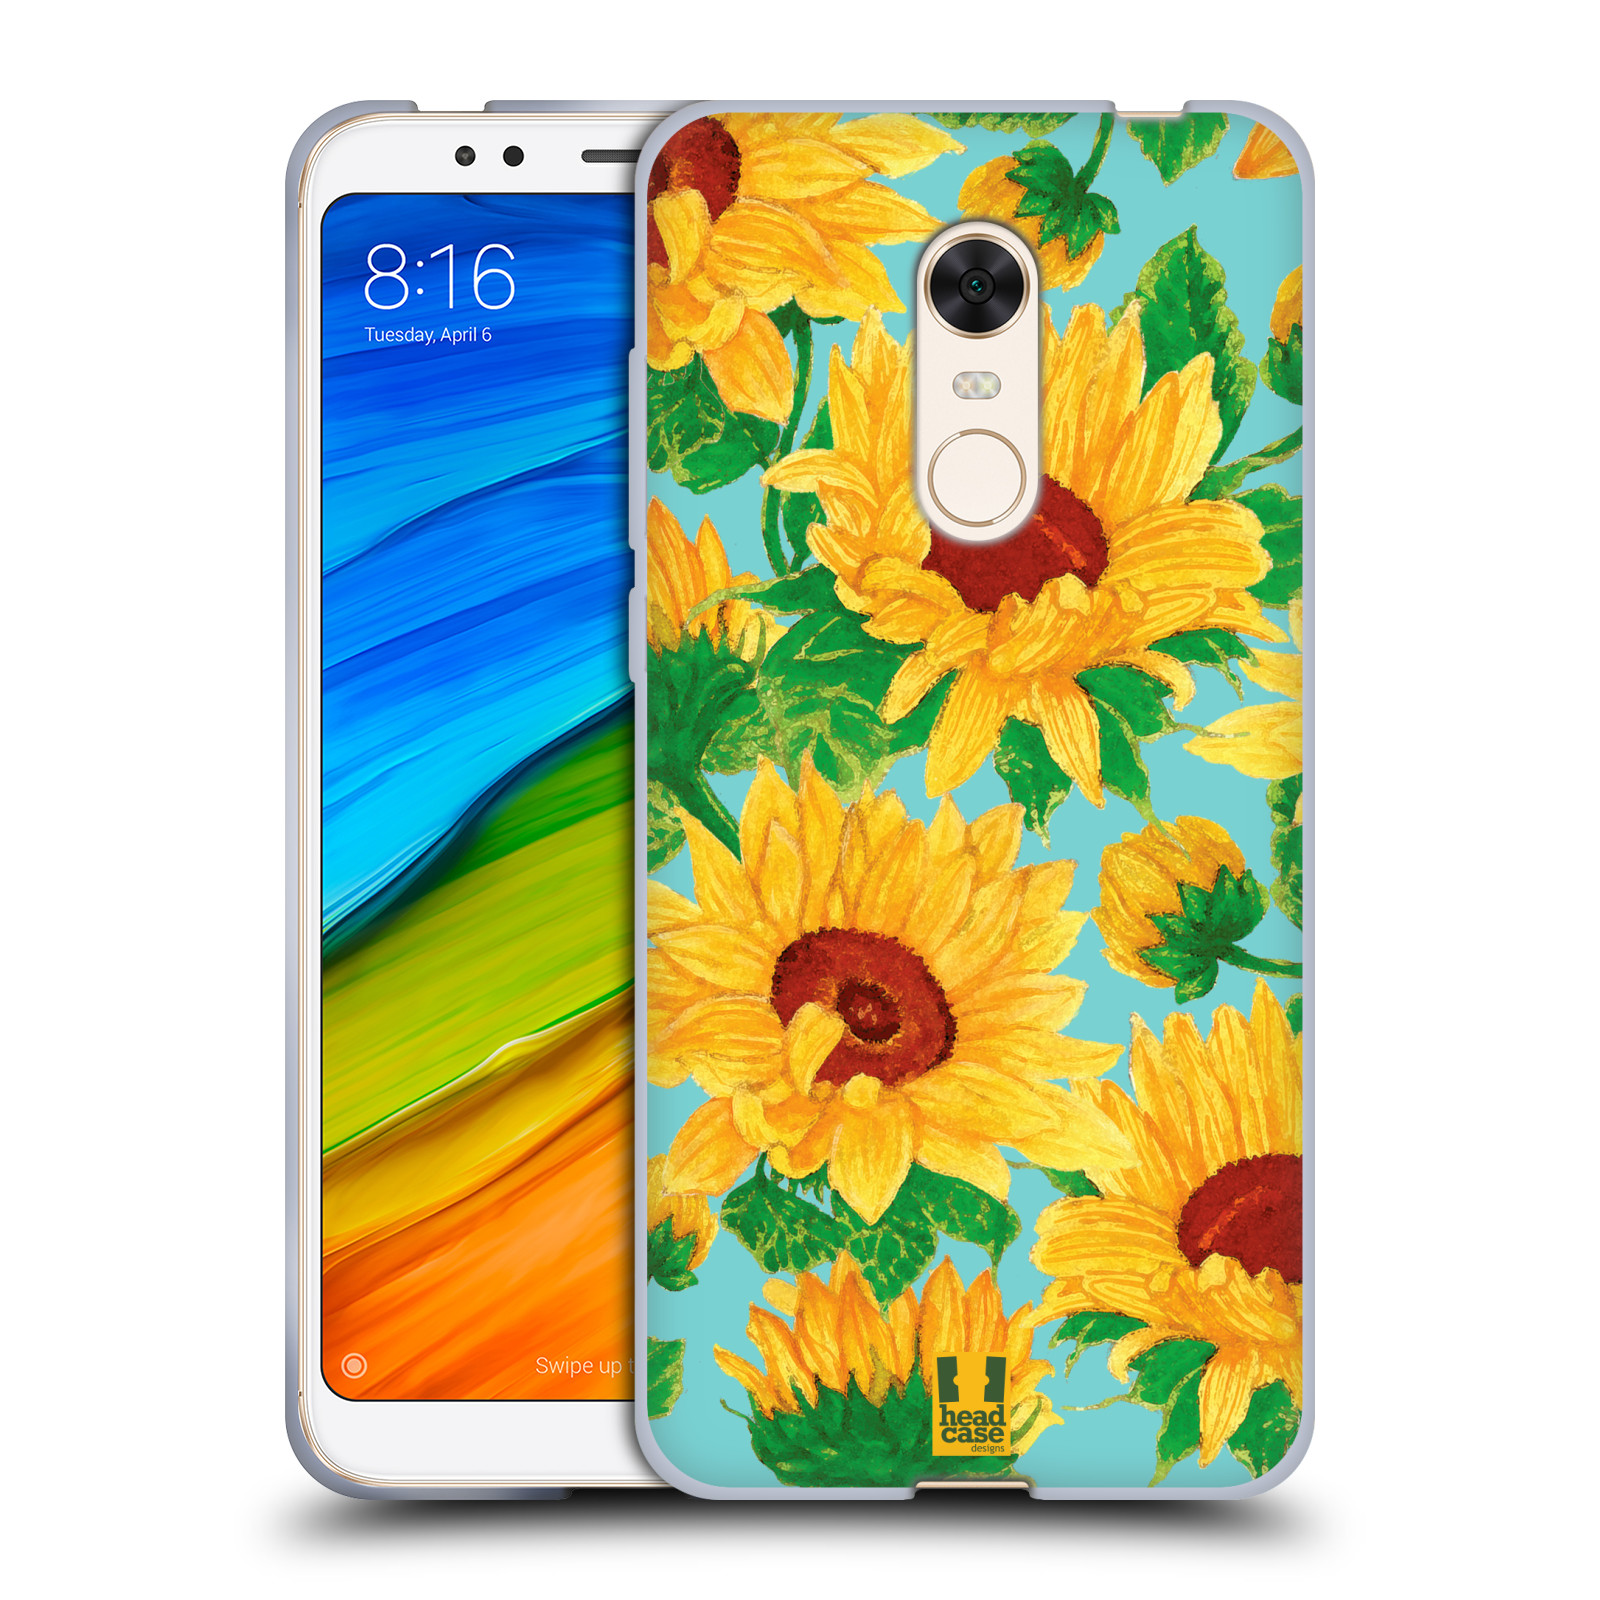 Silikonové pouzdro na mobil Xiaomi Redmi 5 Plus - Head Case - Slunečnice